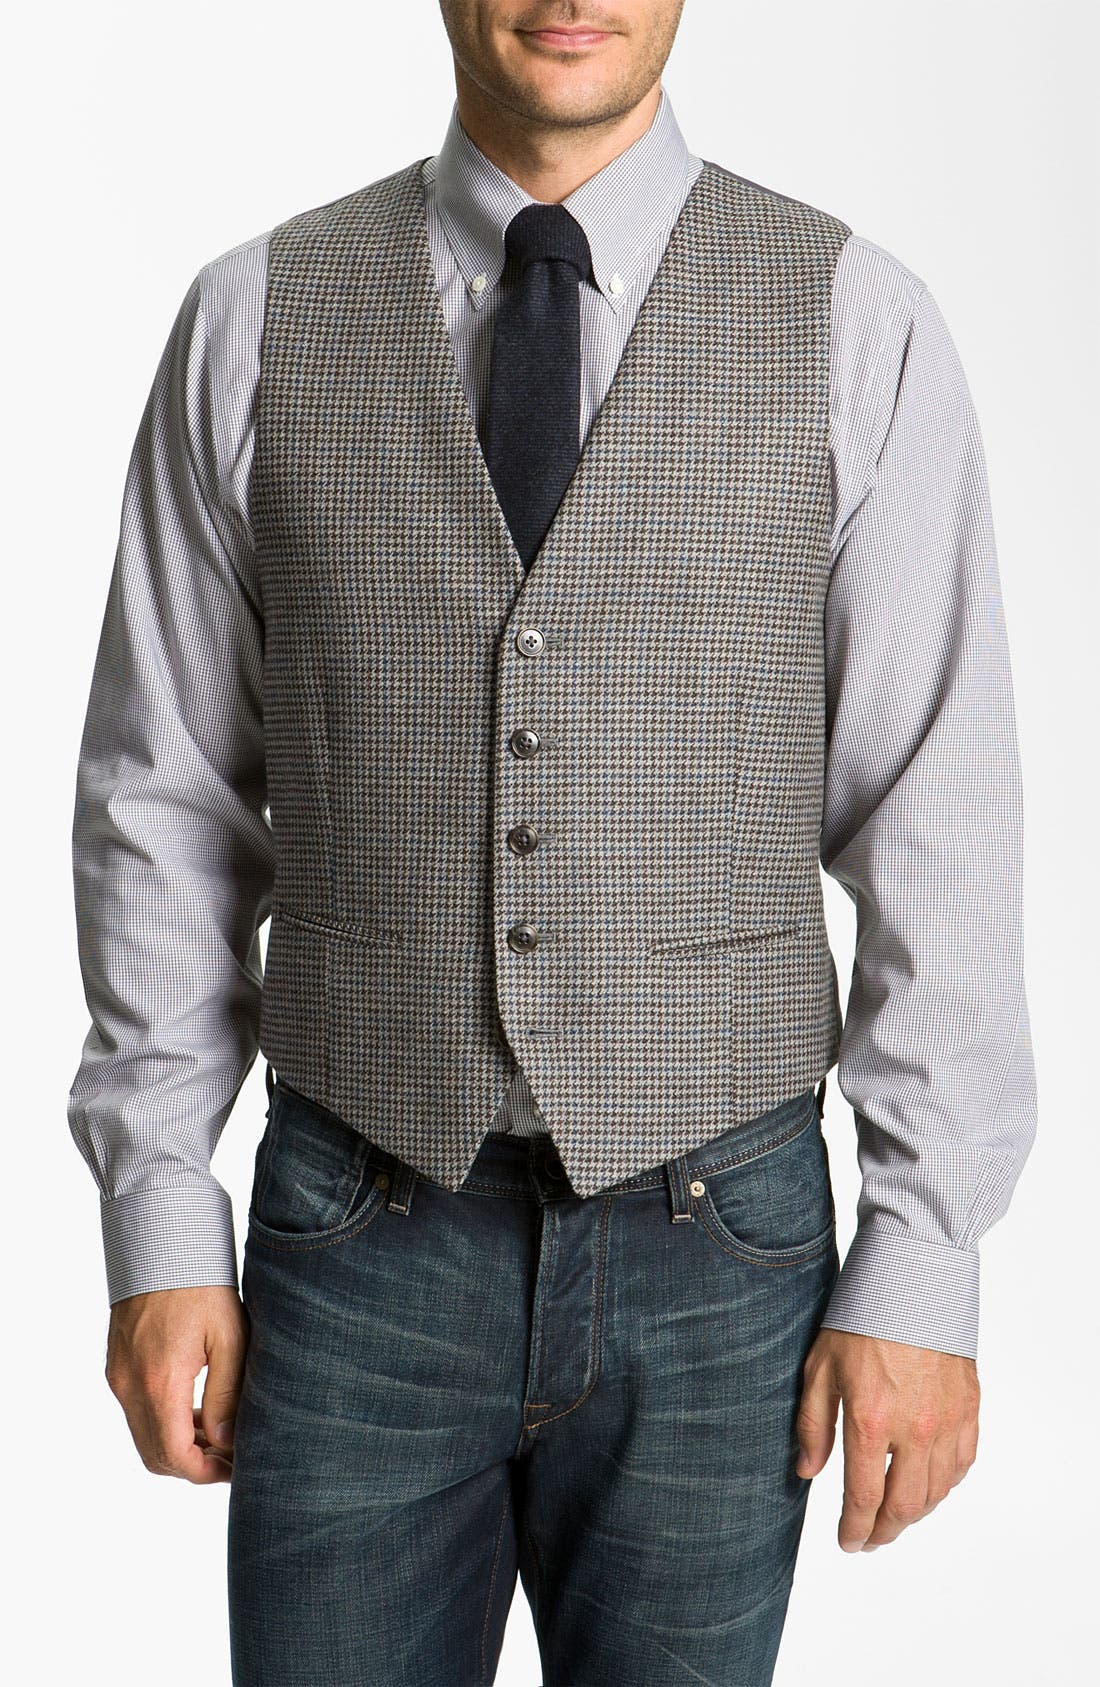 Alternate Image 1 Selected - John W. Nordstrom® Houndstooth Wool Vest